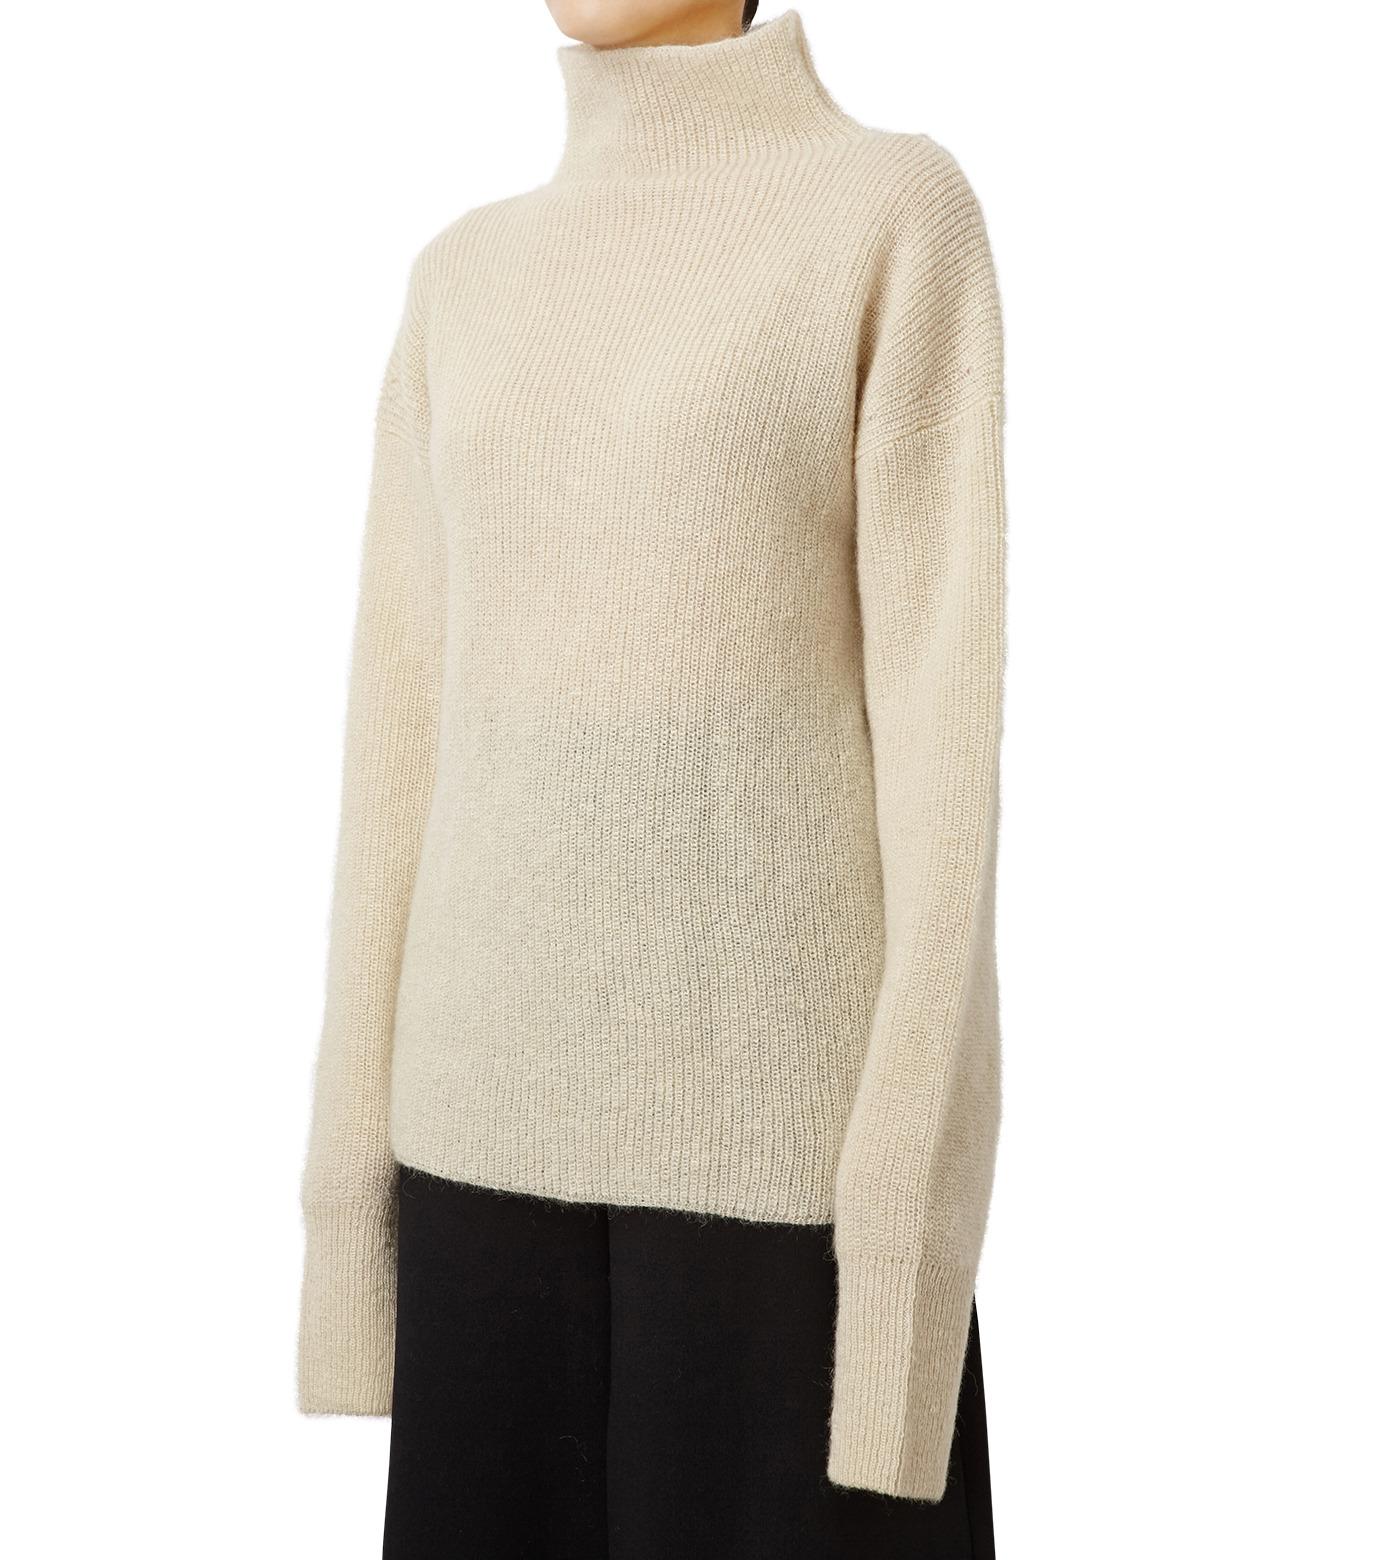 LE CIEL BLEU(ルシェルブルー)のシルクモヘヤニットトップス-WHITE(ニット/knit)-18A61528 拡大詳細画像1